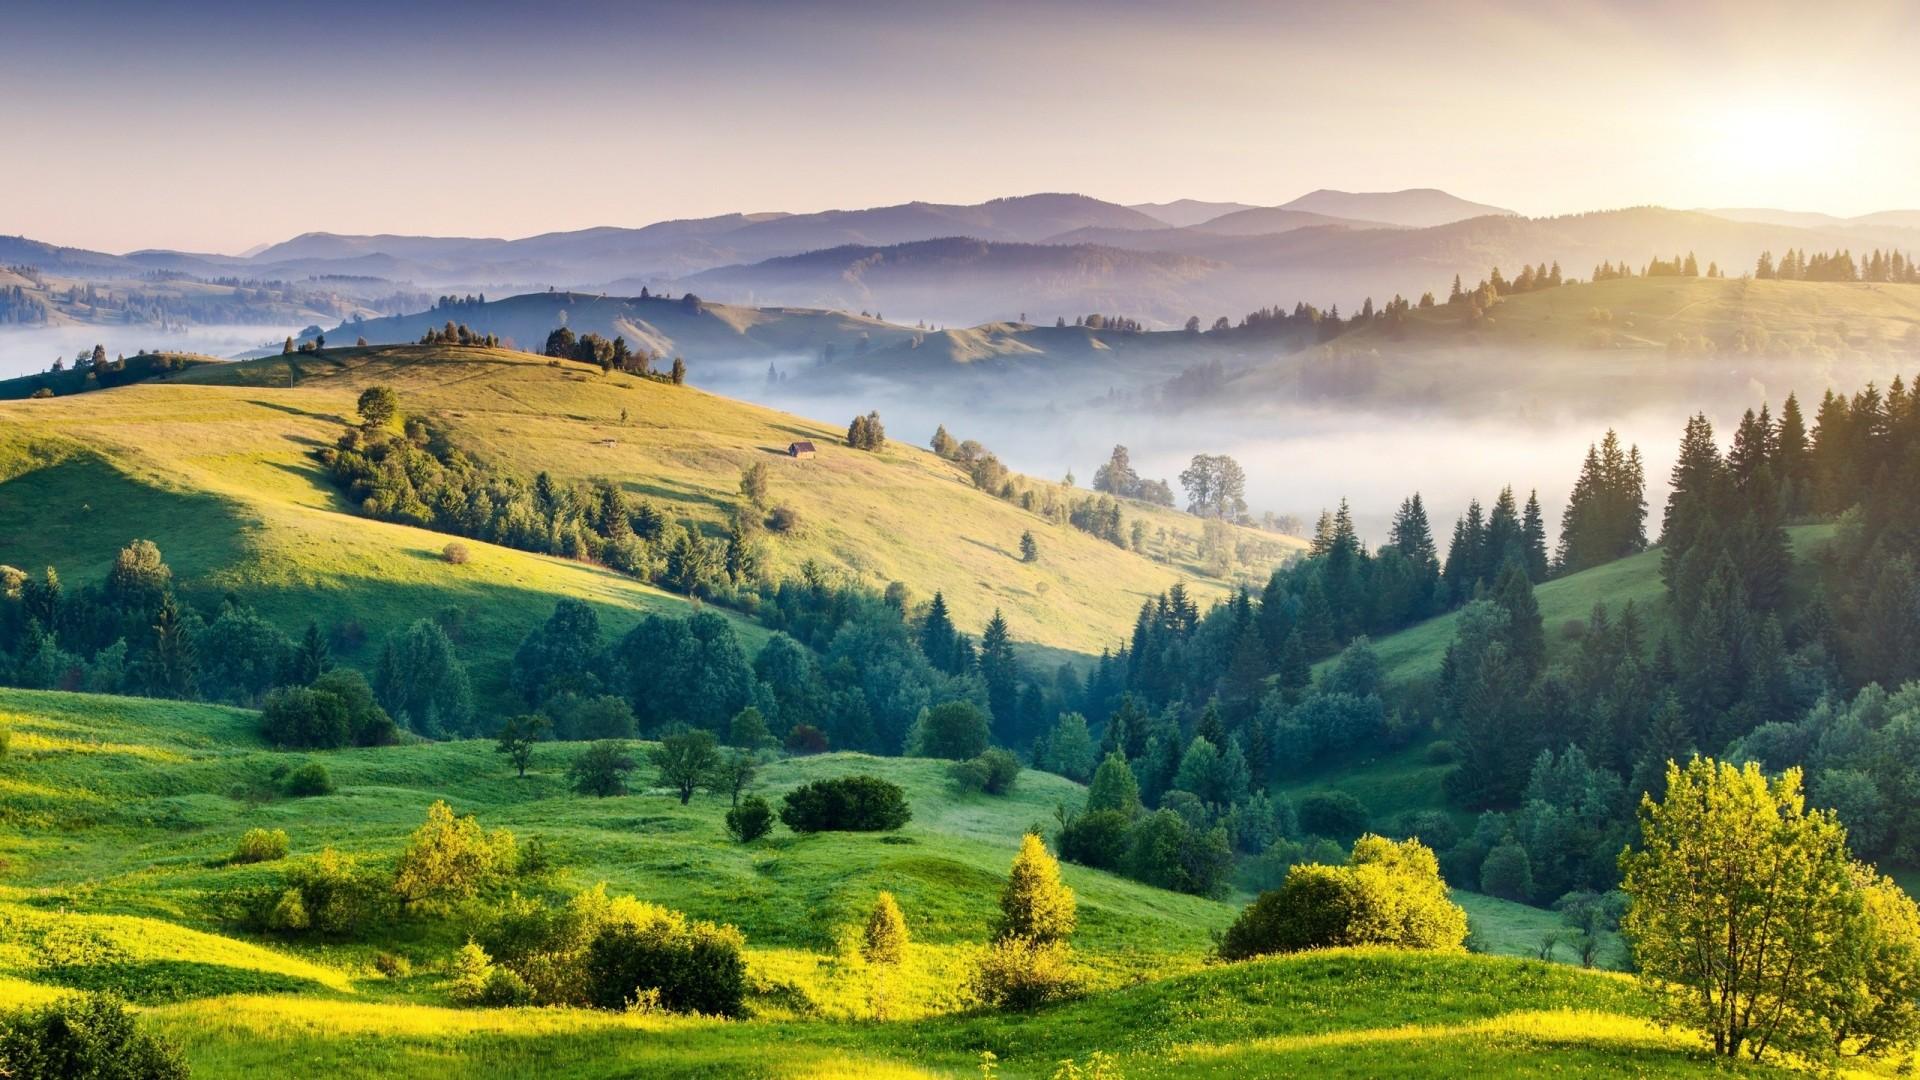 Wallpaper mountains, grass, trees, day, summer